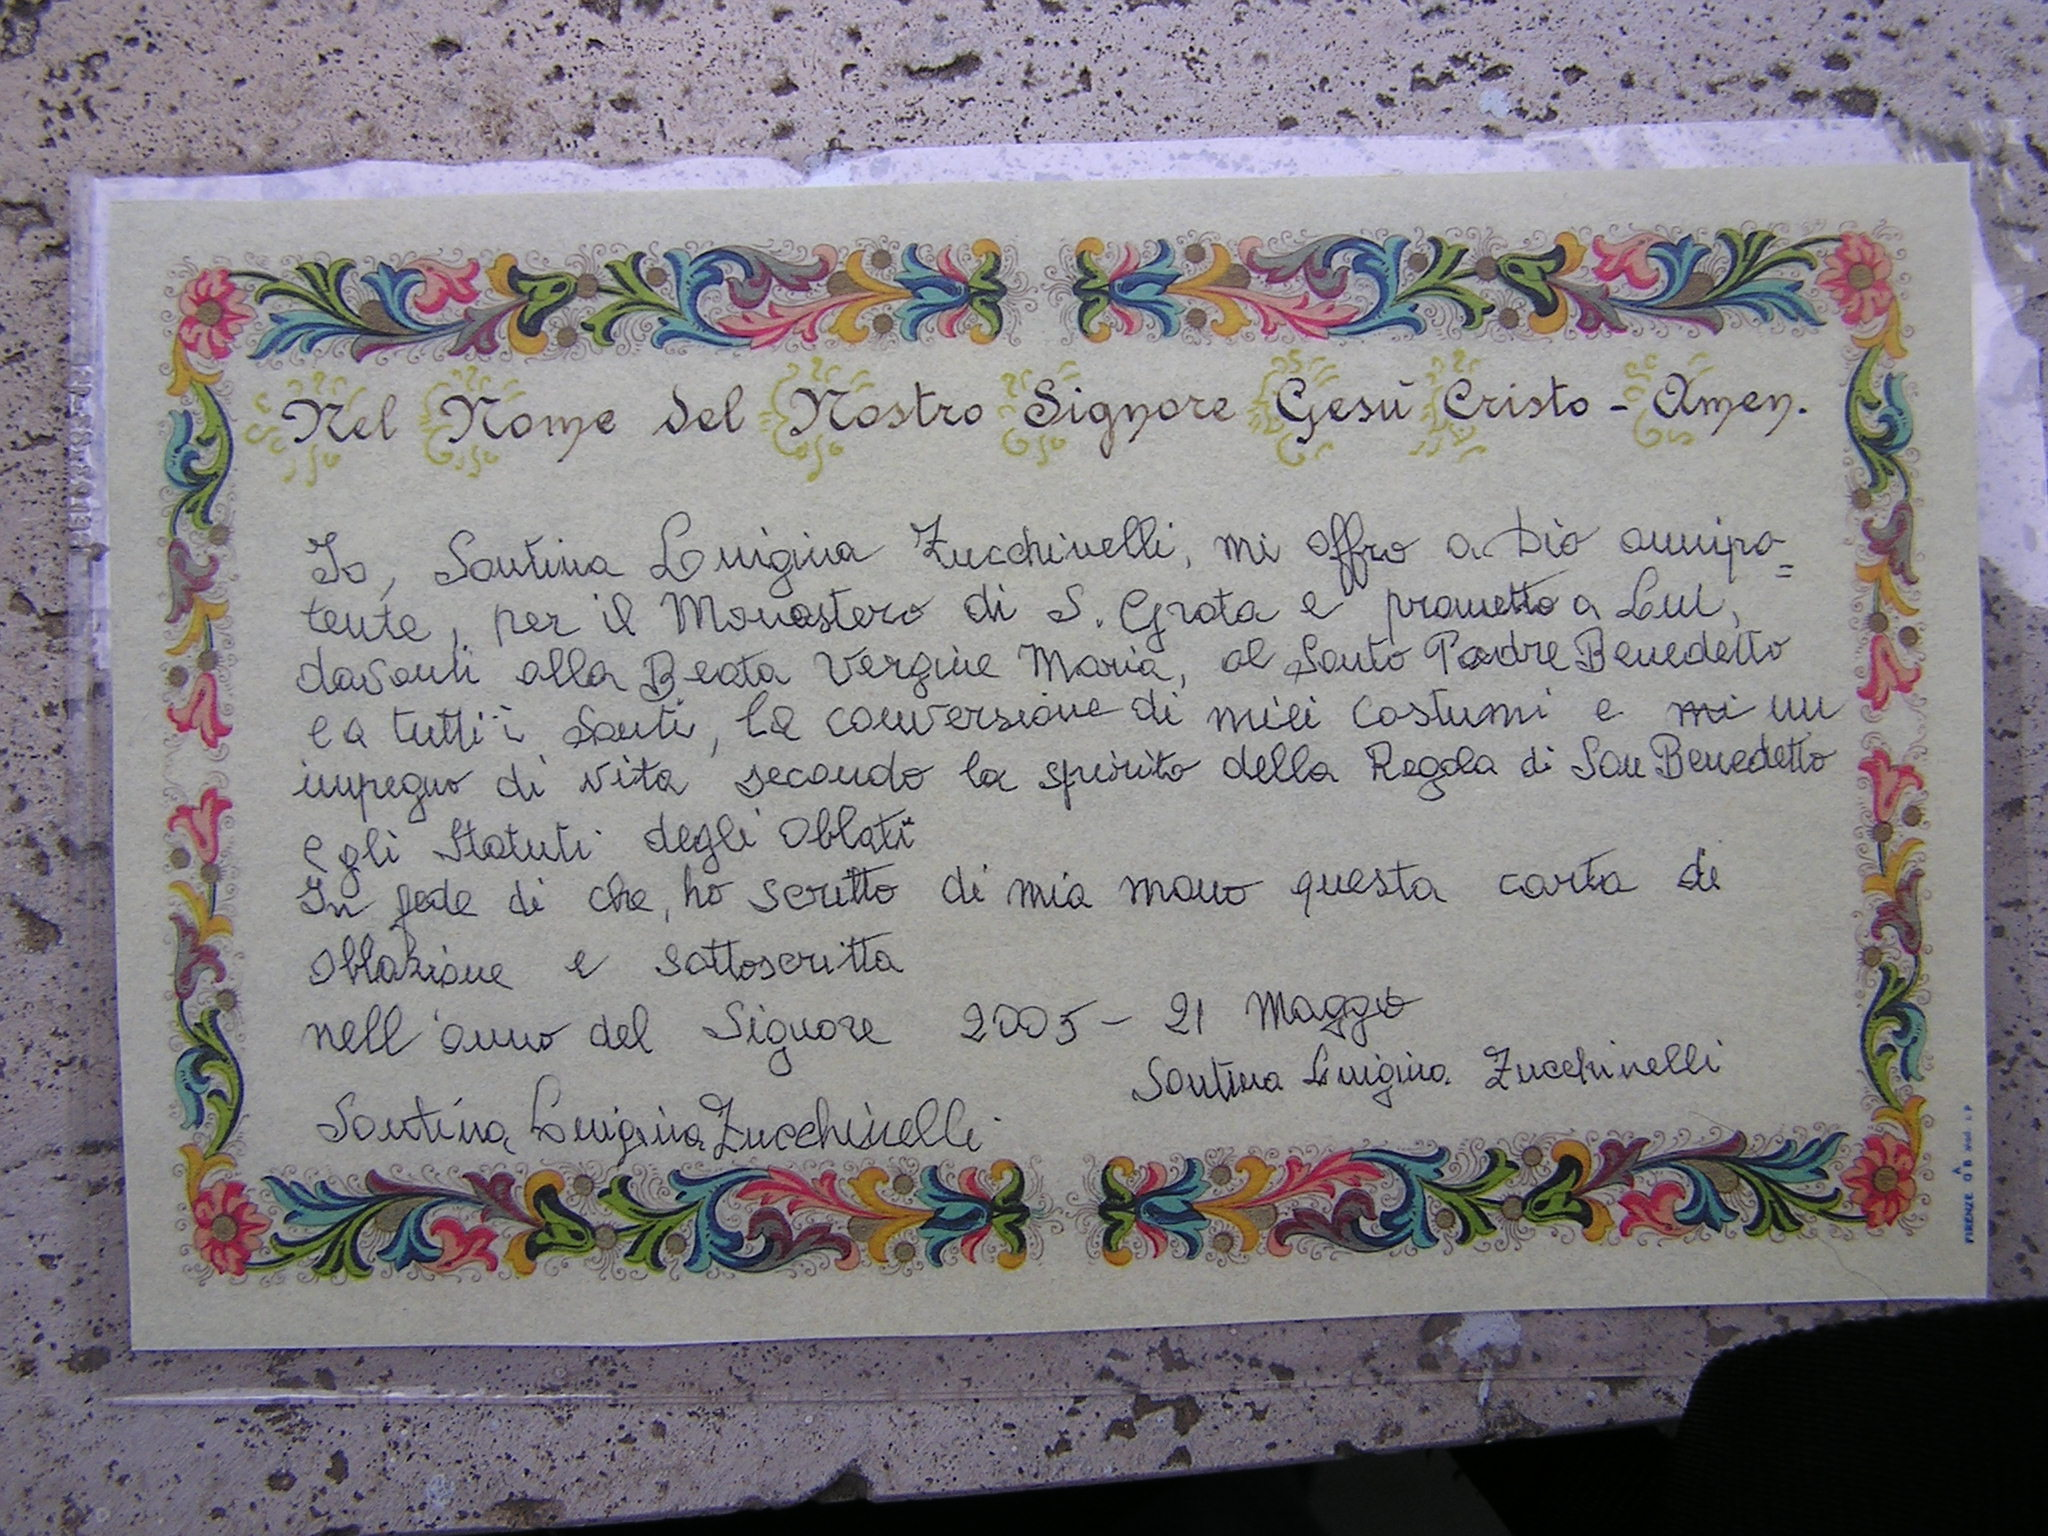 Très desikudiyaan: Frasi Di Auguri Di Compleanno Ad Un Fratello KY66